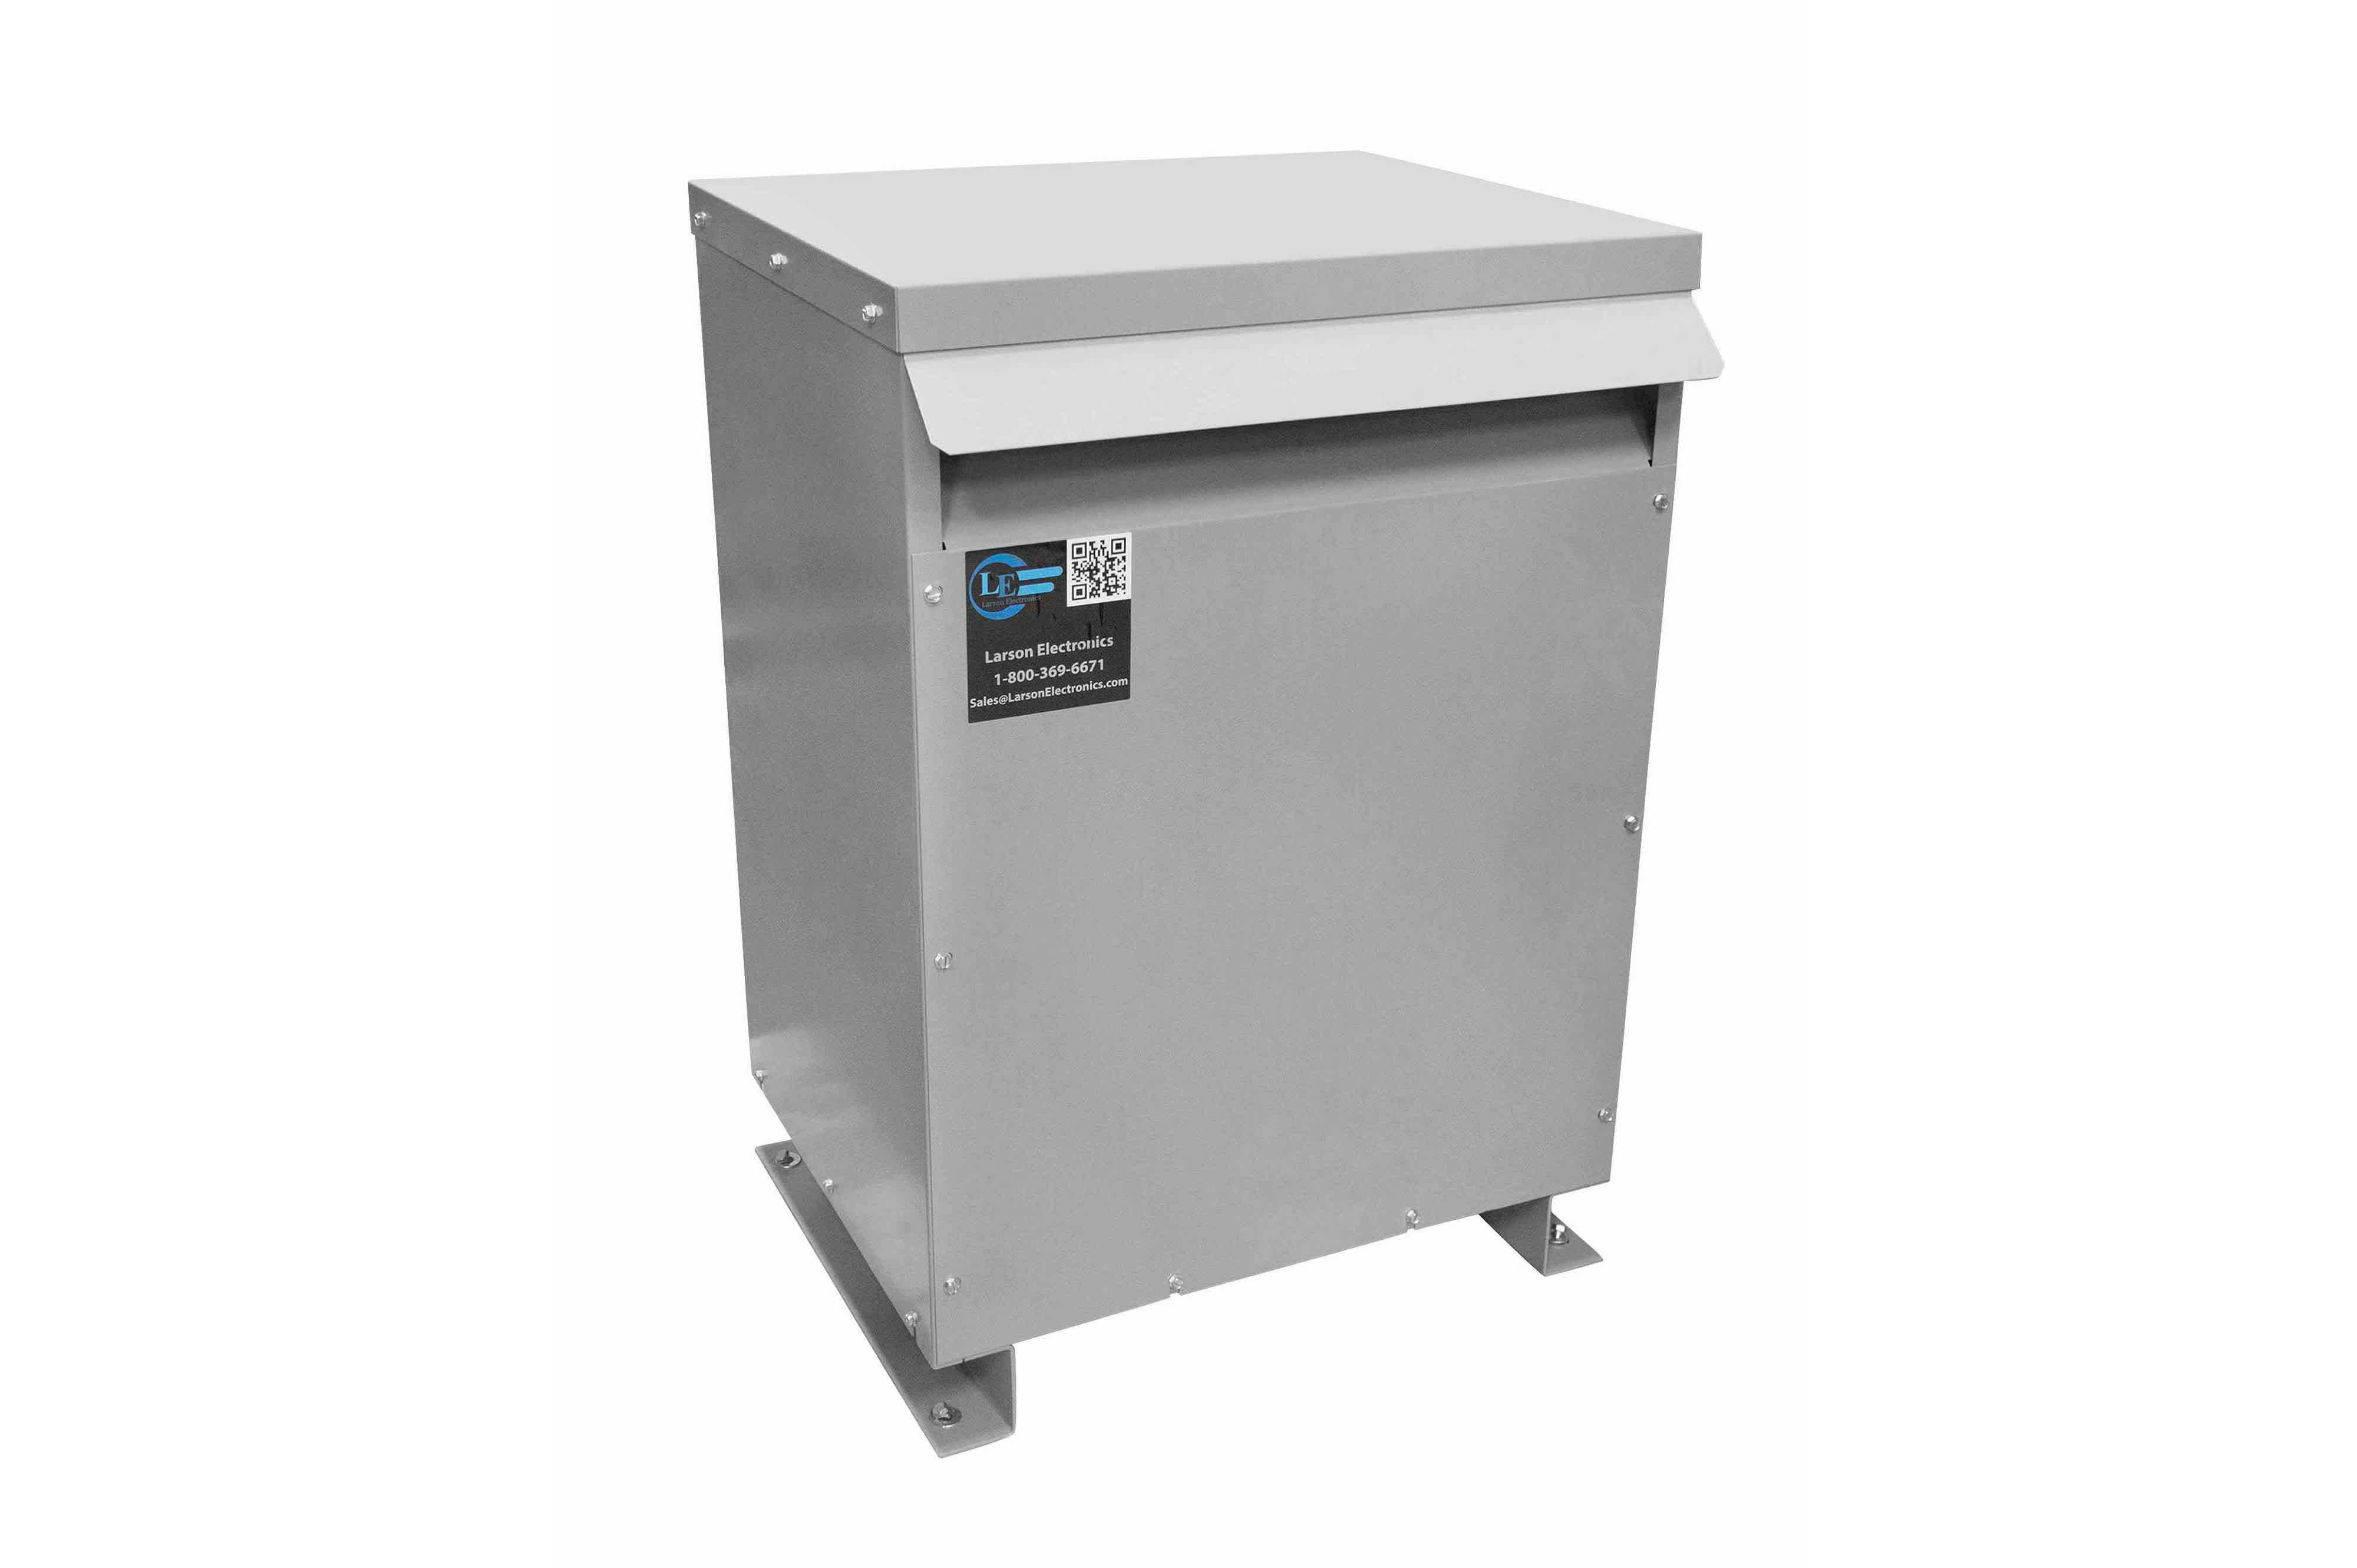 26 kVA 3PH Isolation Transformer, 480V Wye Primary, 400Y/231 Wye-N Secondary, N3R, Ventilated, 60 Hz